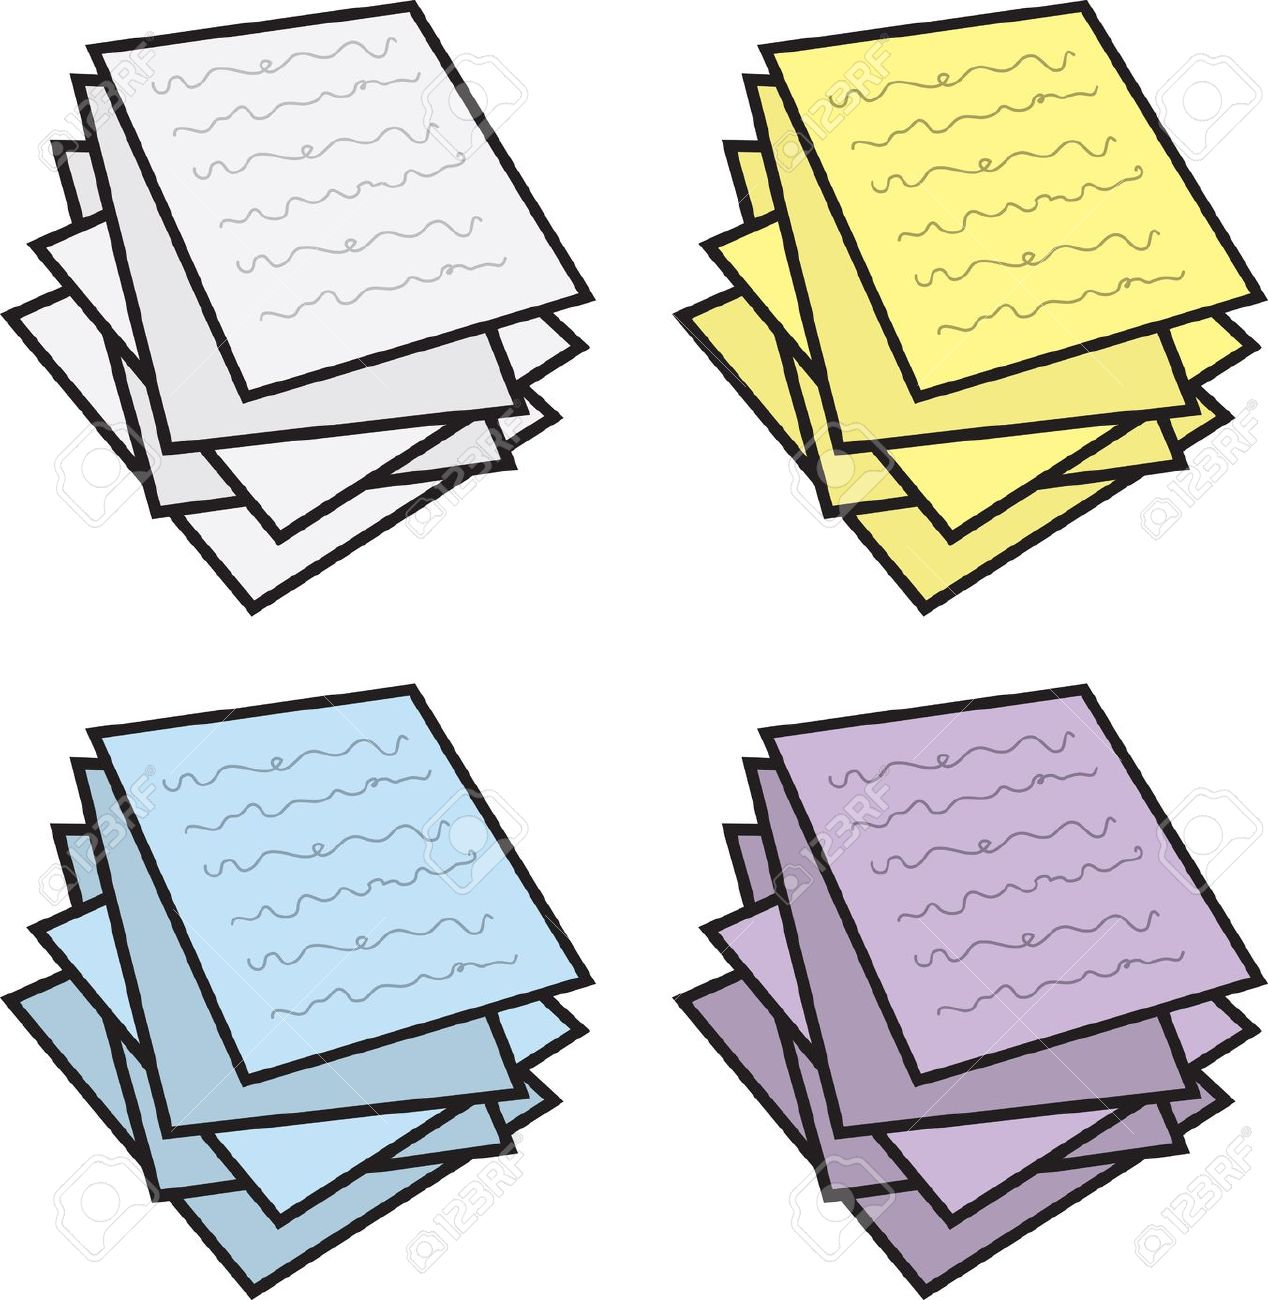 1268x1300 Paper Clip Art Images Free Clipart